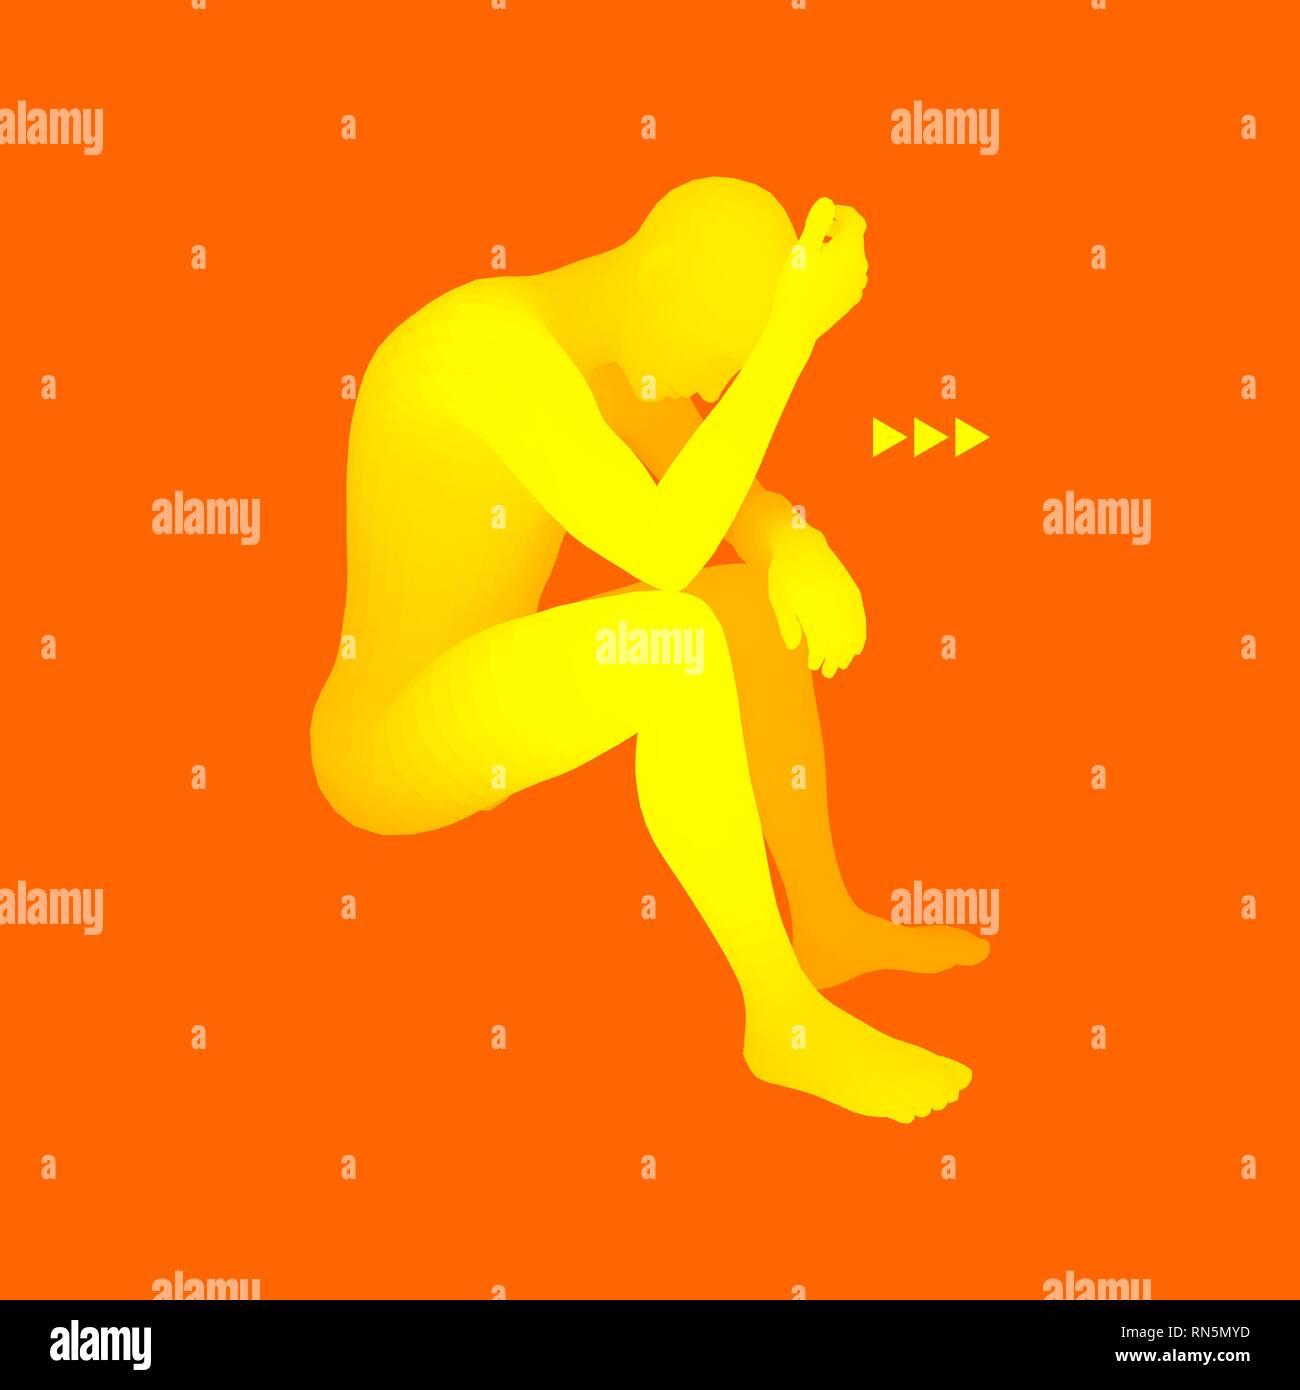 Man Thinks about a Problem. Despair, Depression, Hopelessness, Addiction Concept. 3D Model of Man. Vector Illustration. - Stock Vector